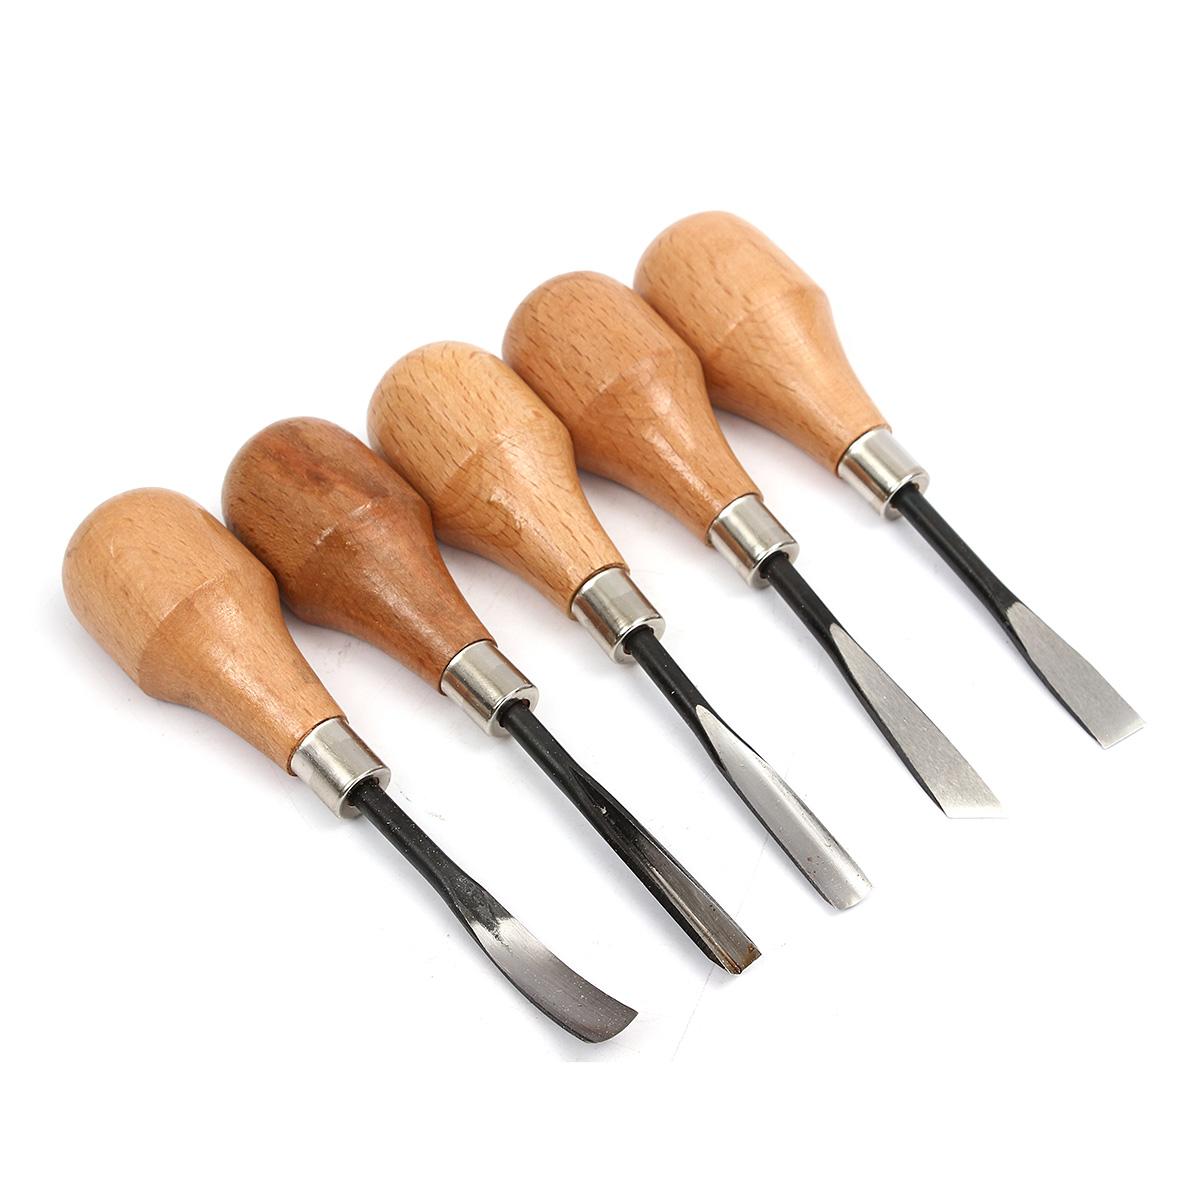 Pcs set hand wood carving chisels knife diy tools for